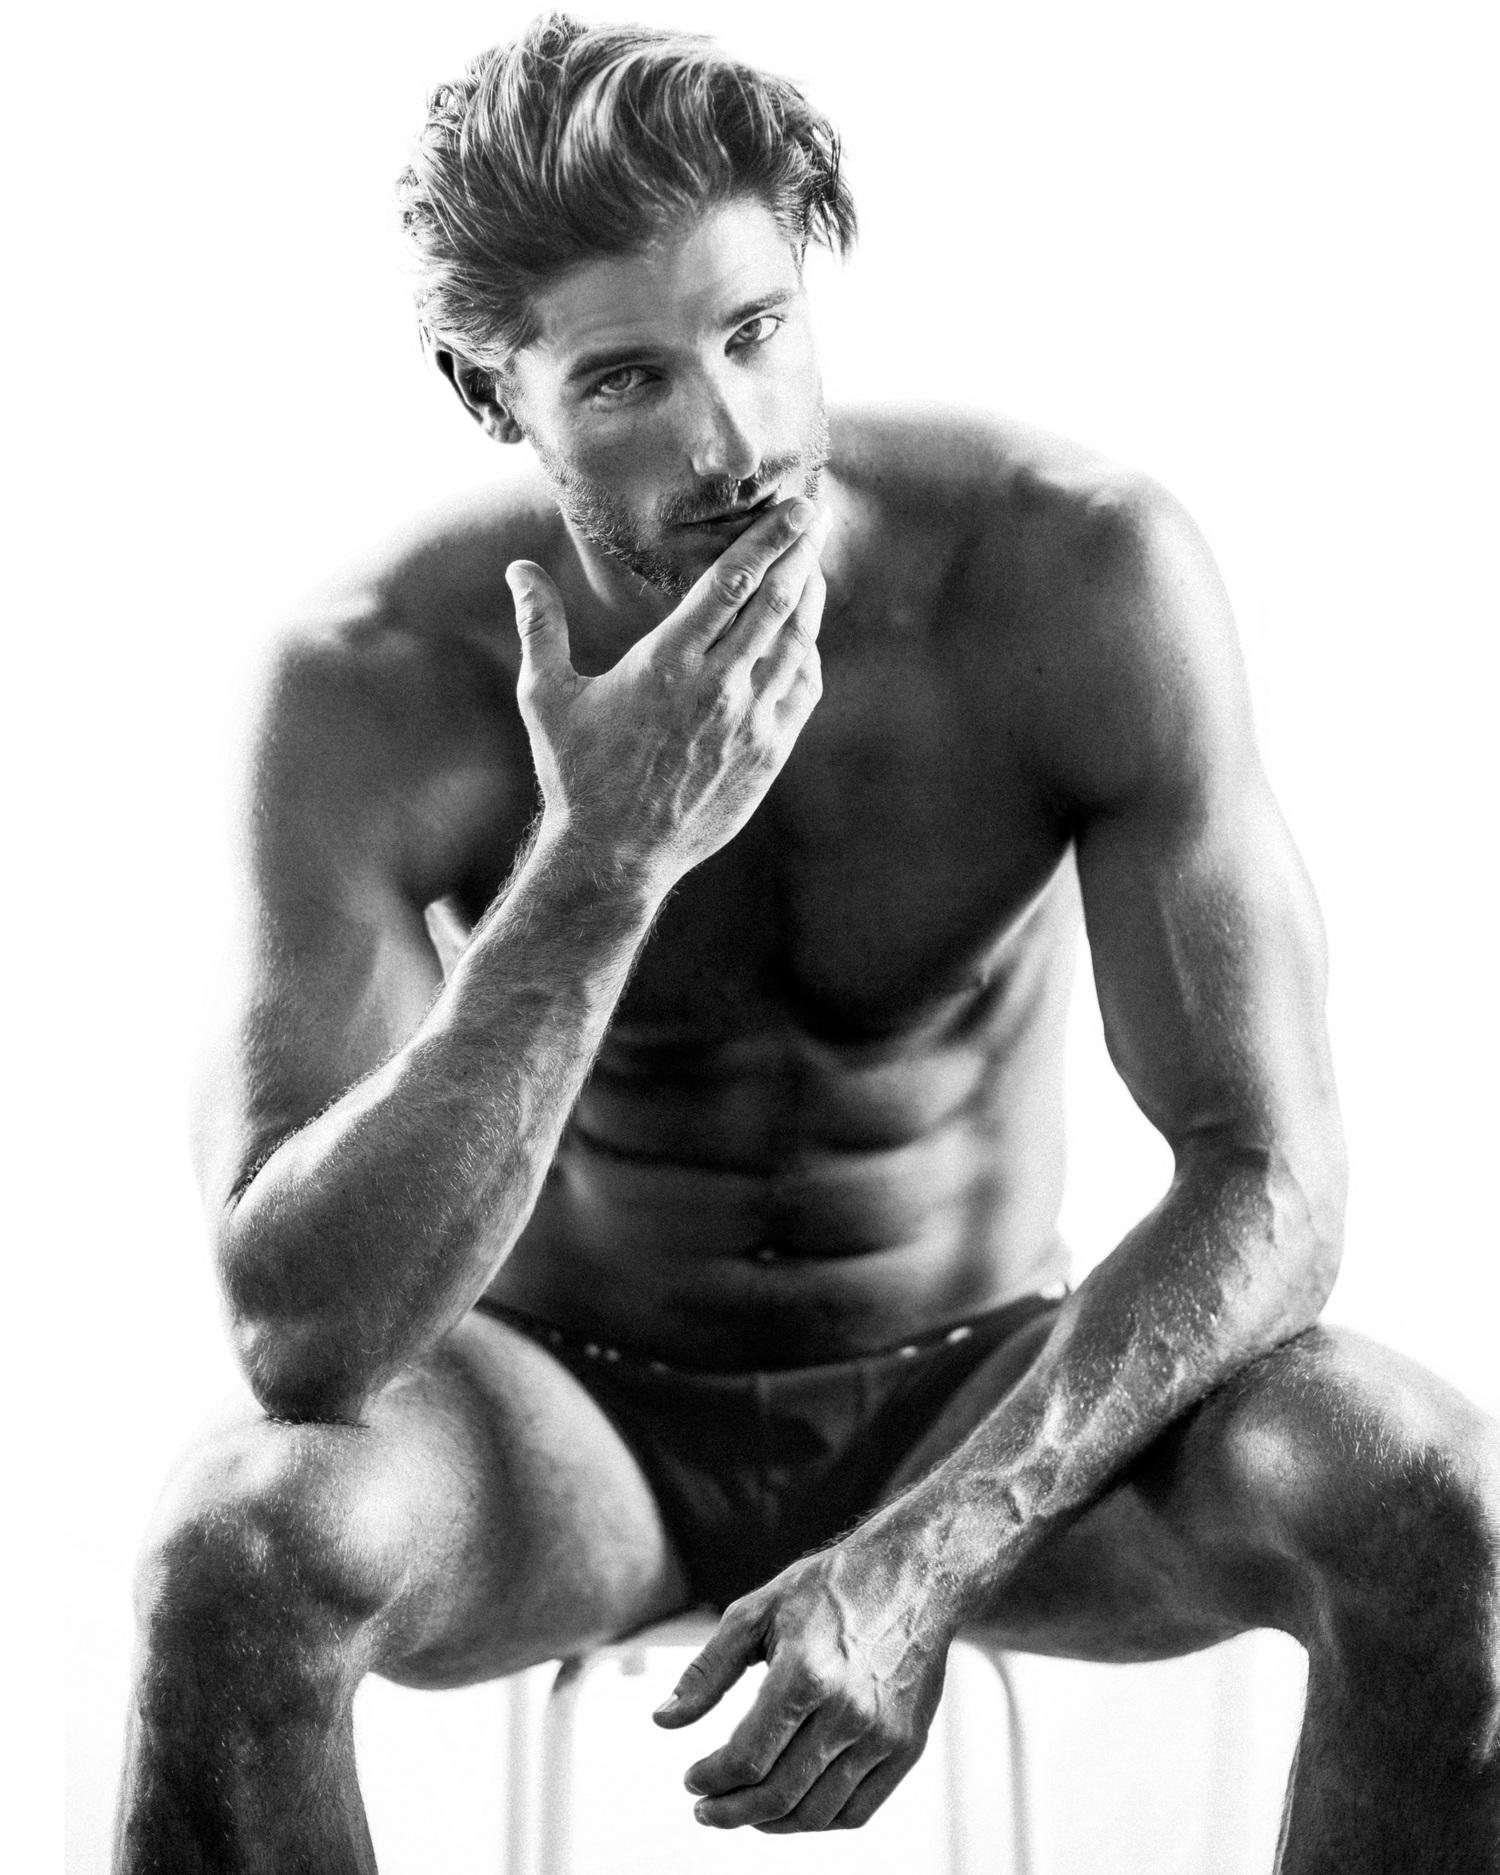 Adon Exclusive: Model Adam Nicklas By Blake Ballard